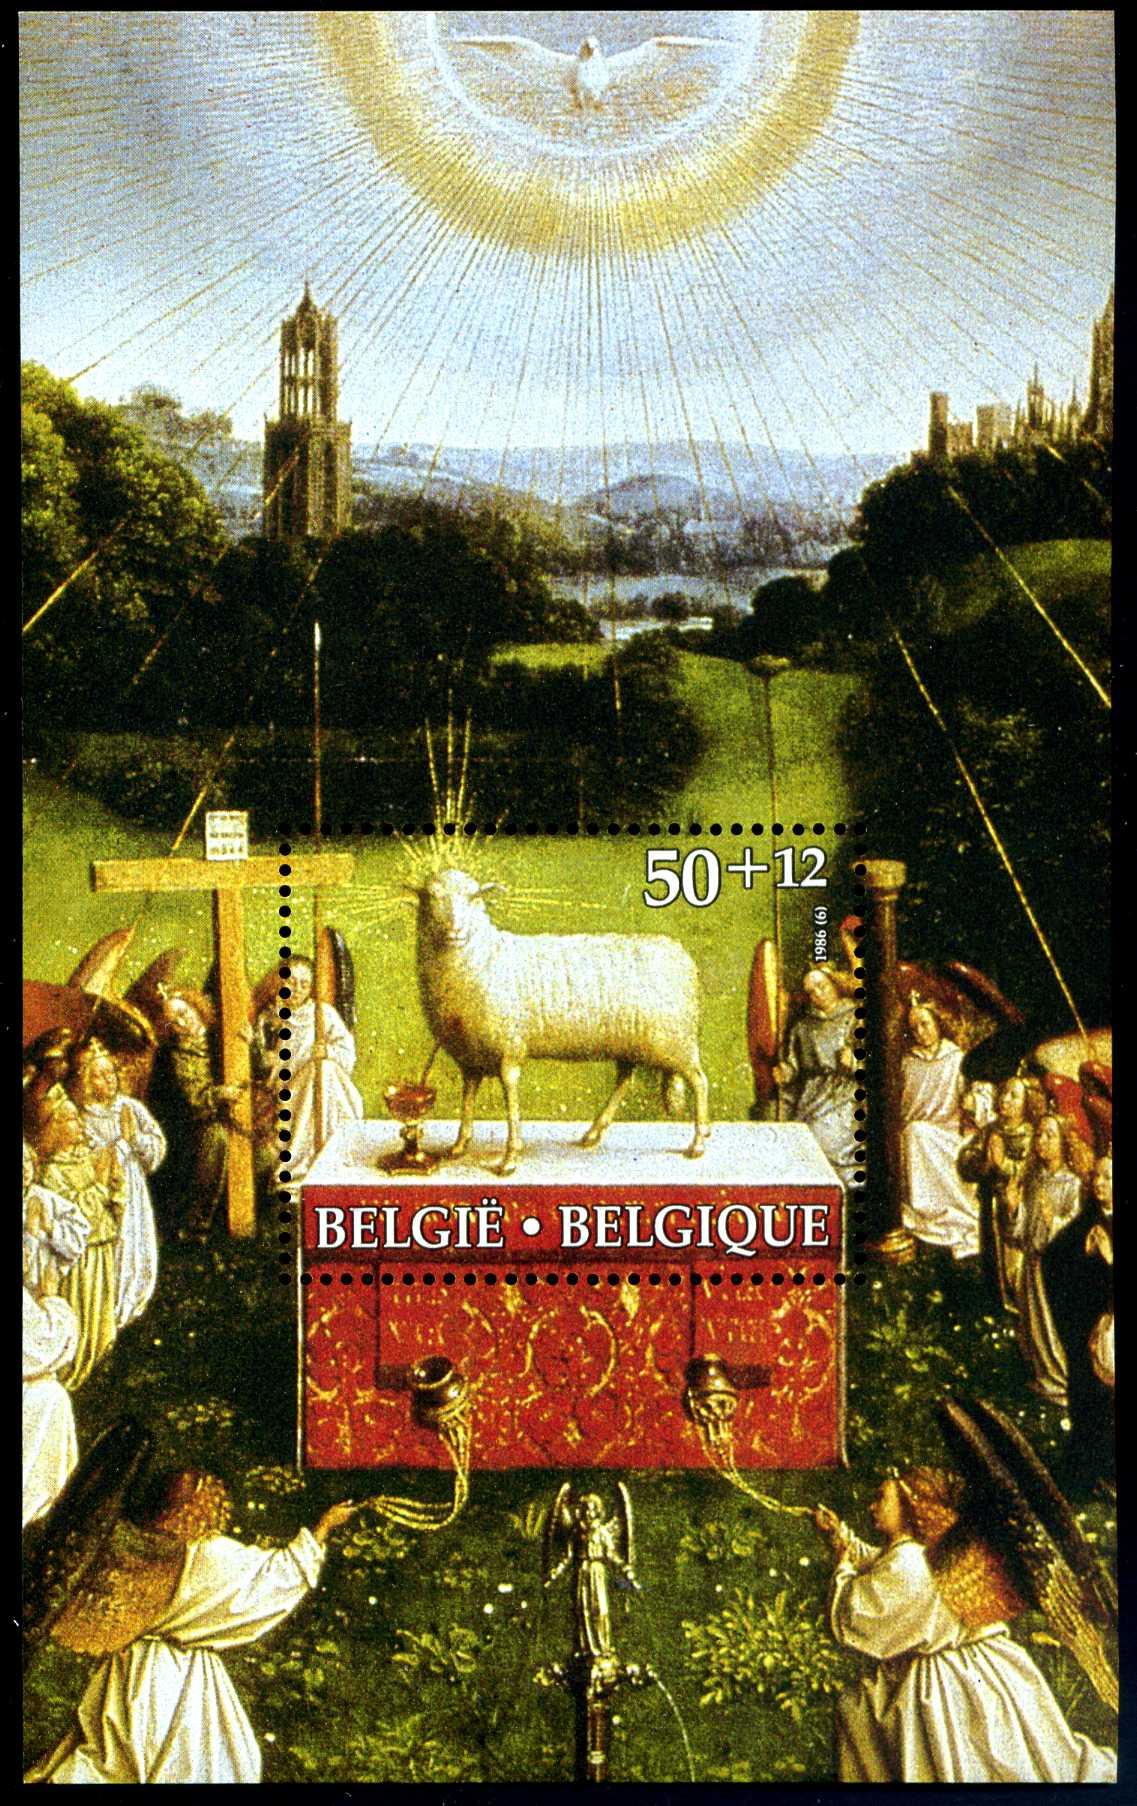 BE 386 1986 van Eyck Altar 2 Lamm.jpg